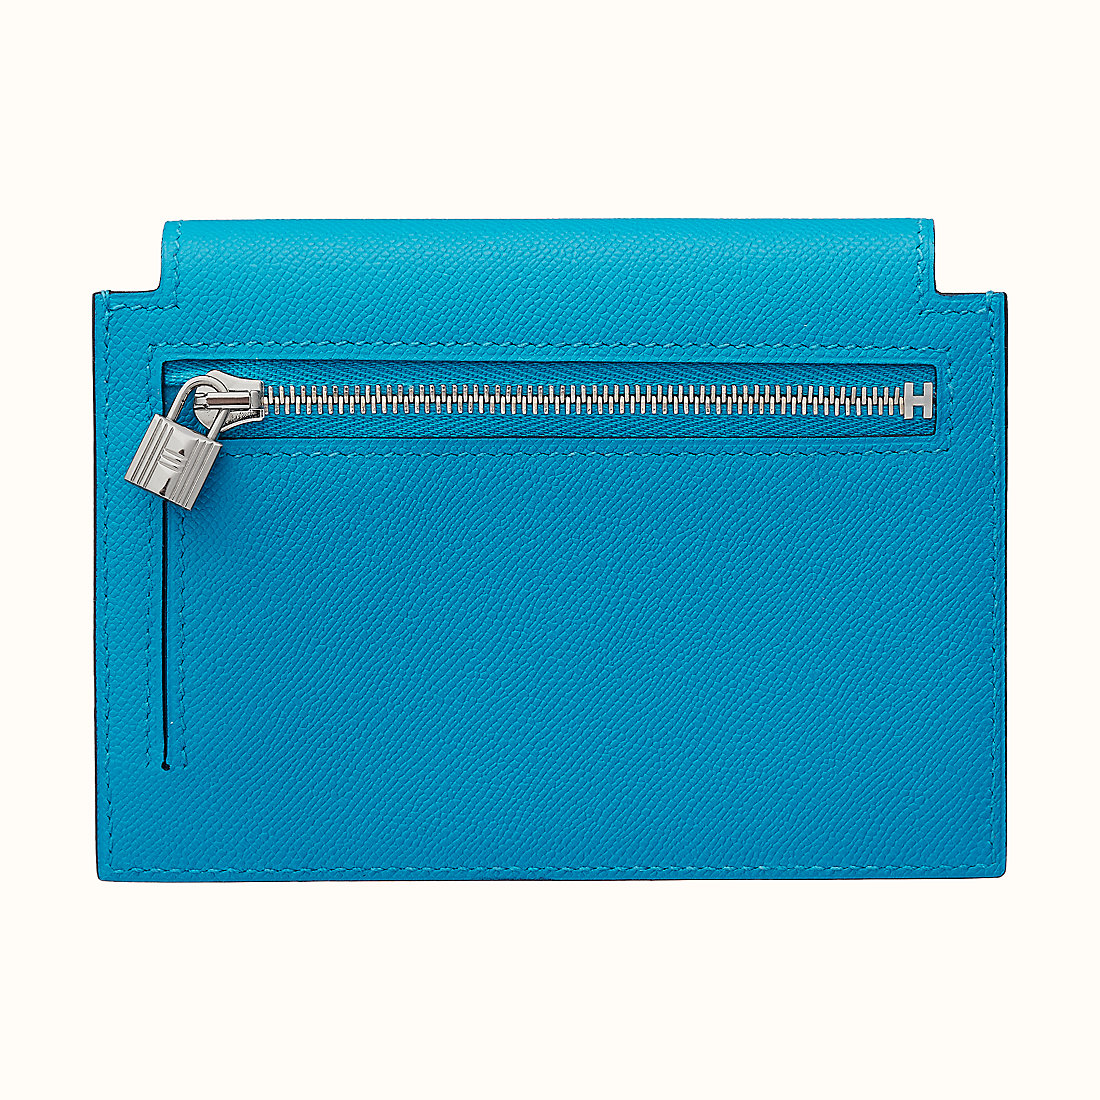 香港九龍城區紅磡 九龍城 Hong Kong Hermes Kelly pocket CK0F Bleu Frida